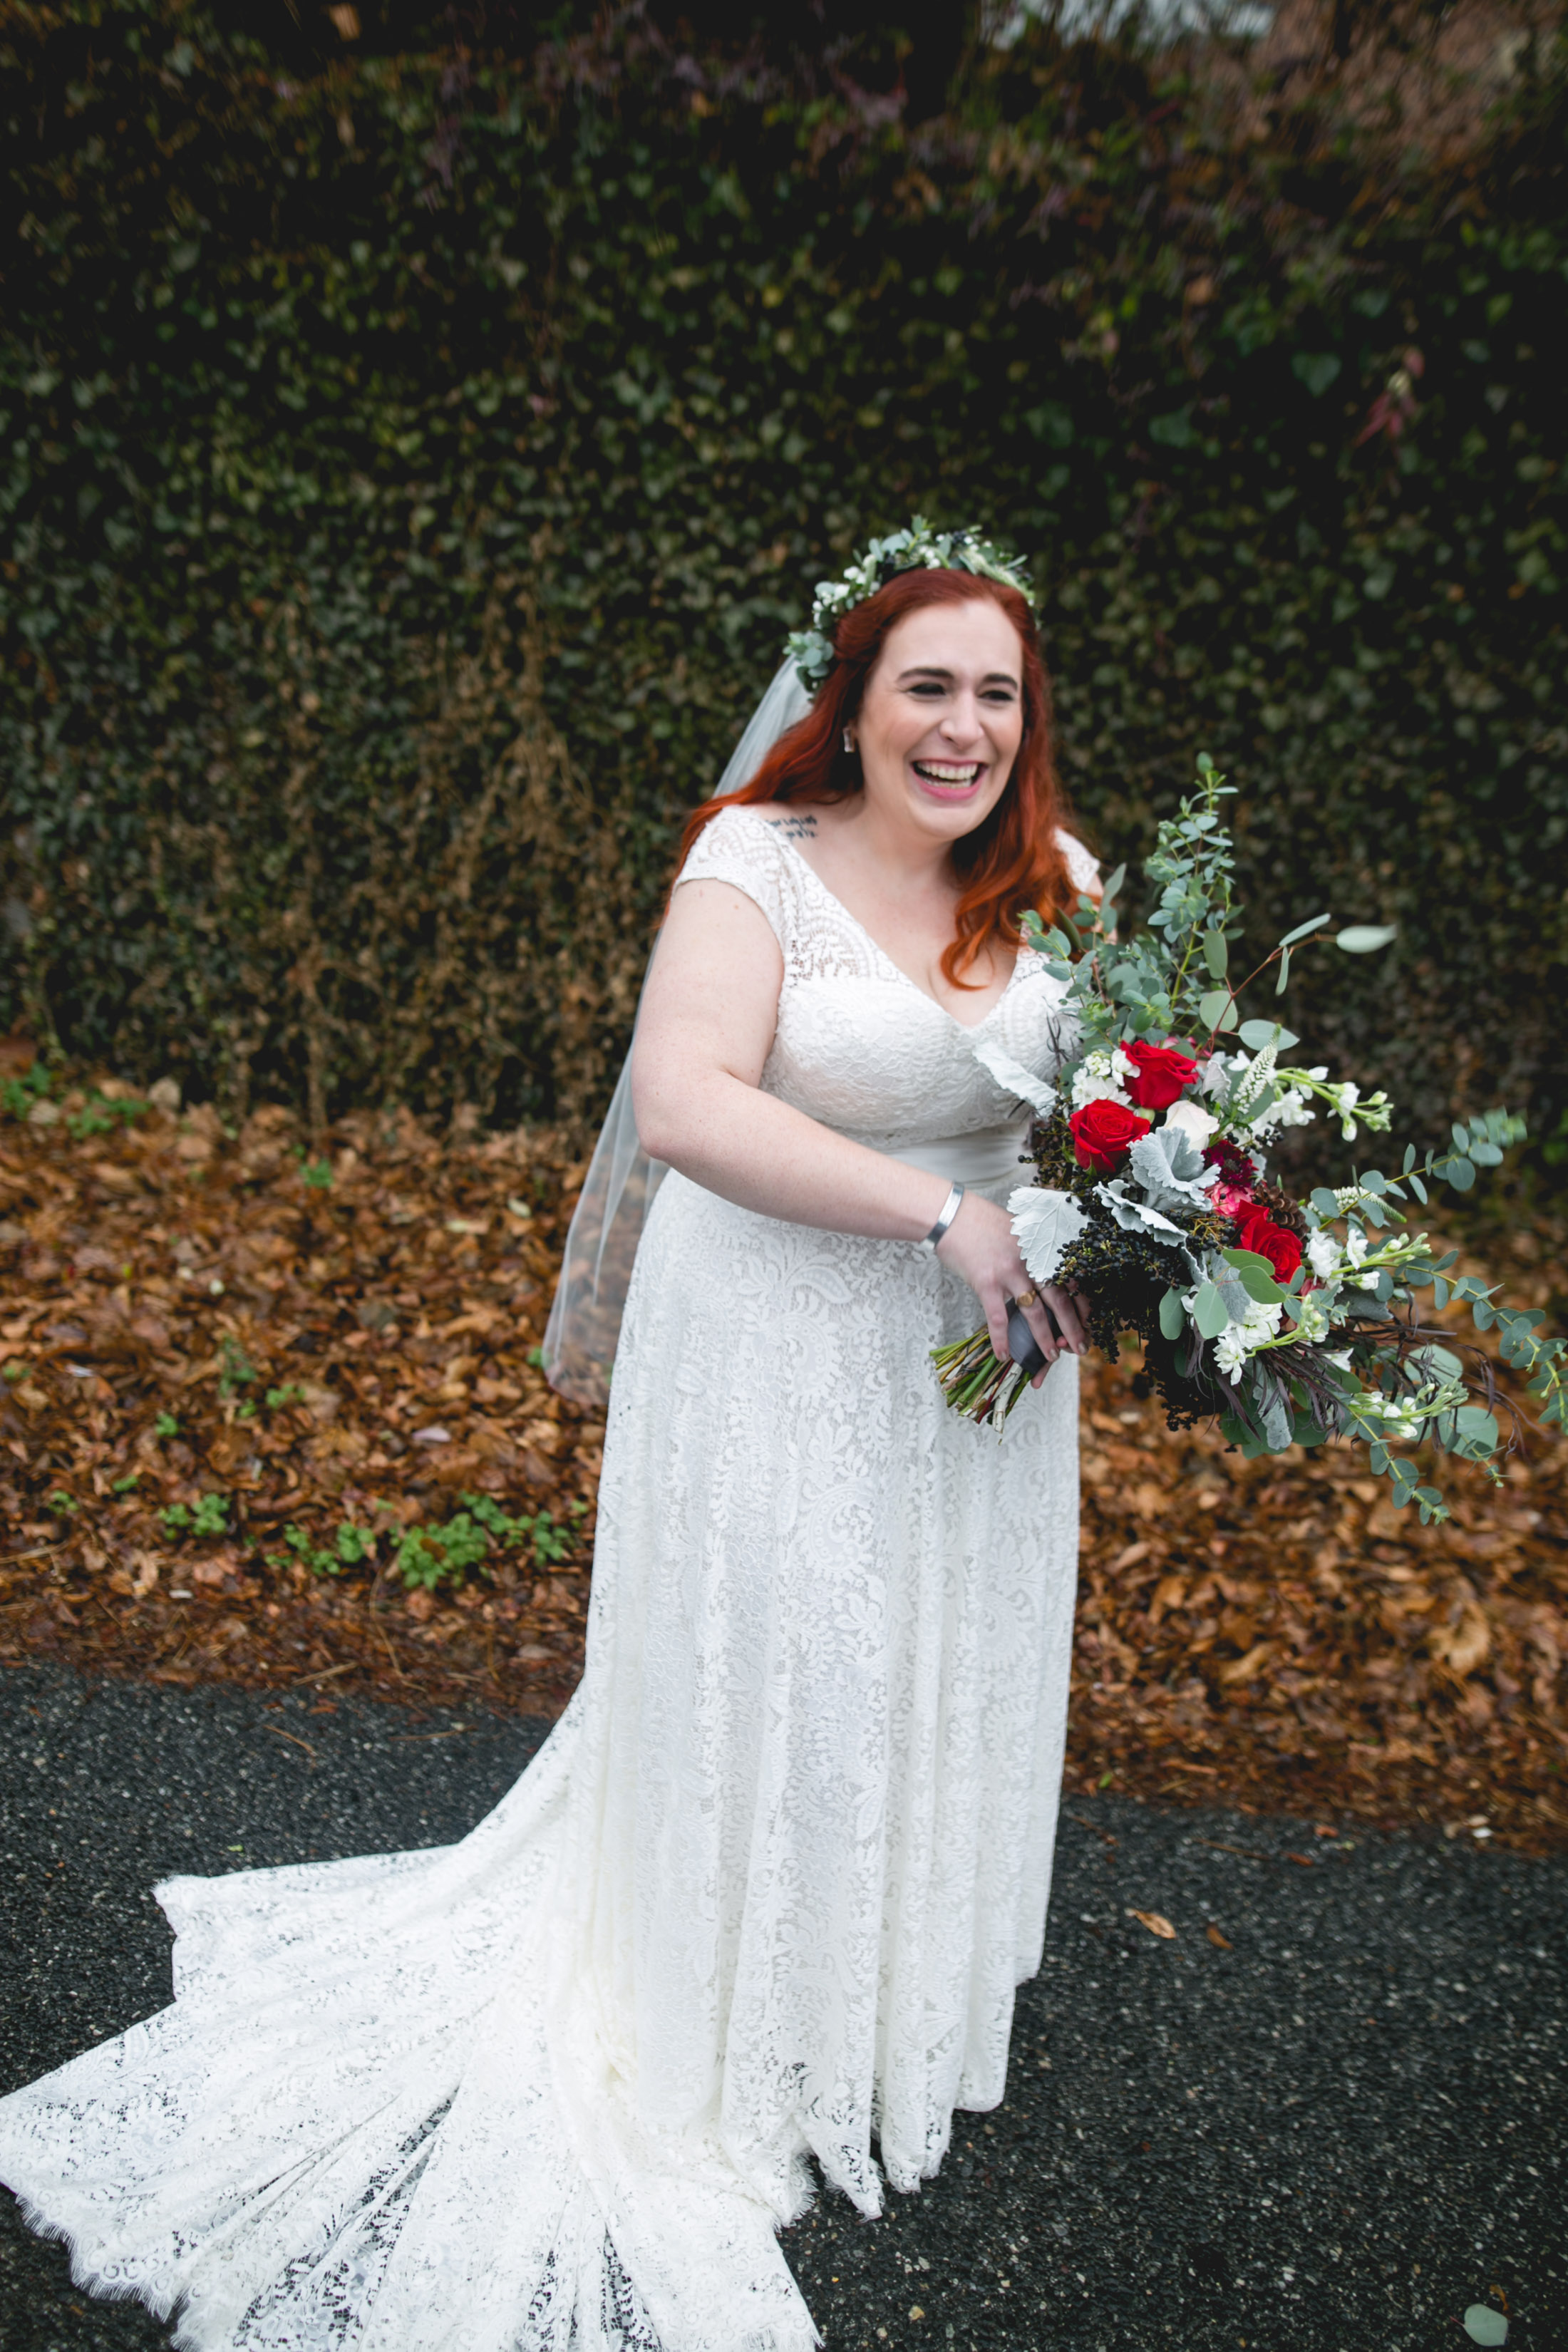 LGBTQ Philadelphia Wedding by Swiger Photography the Lesbian photographer 22